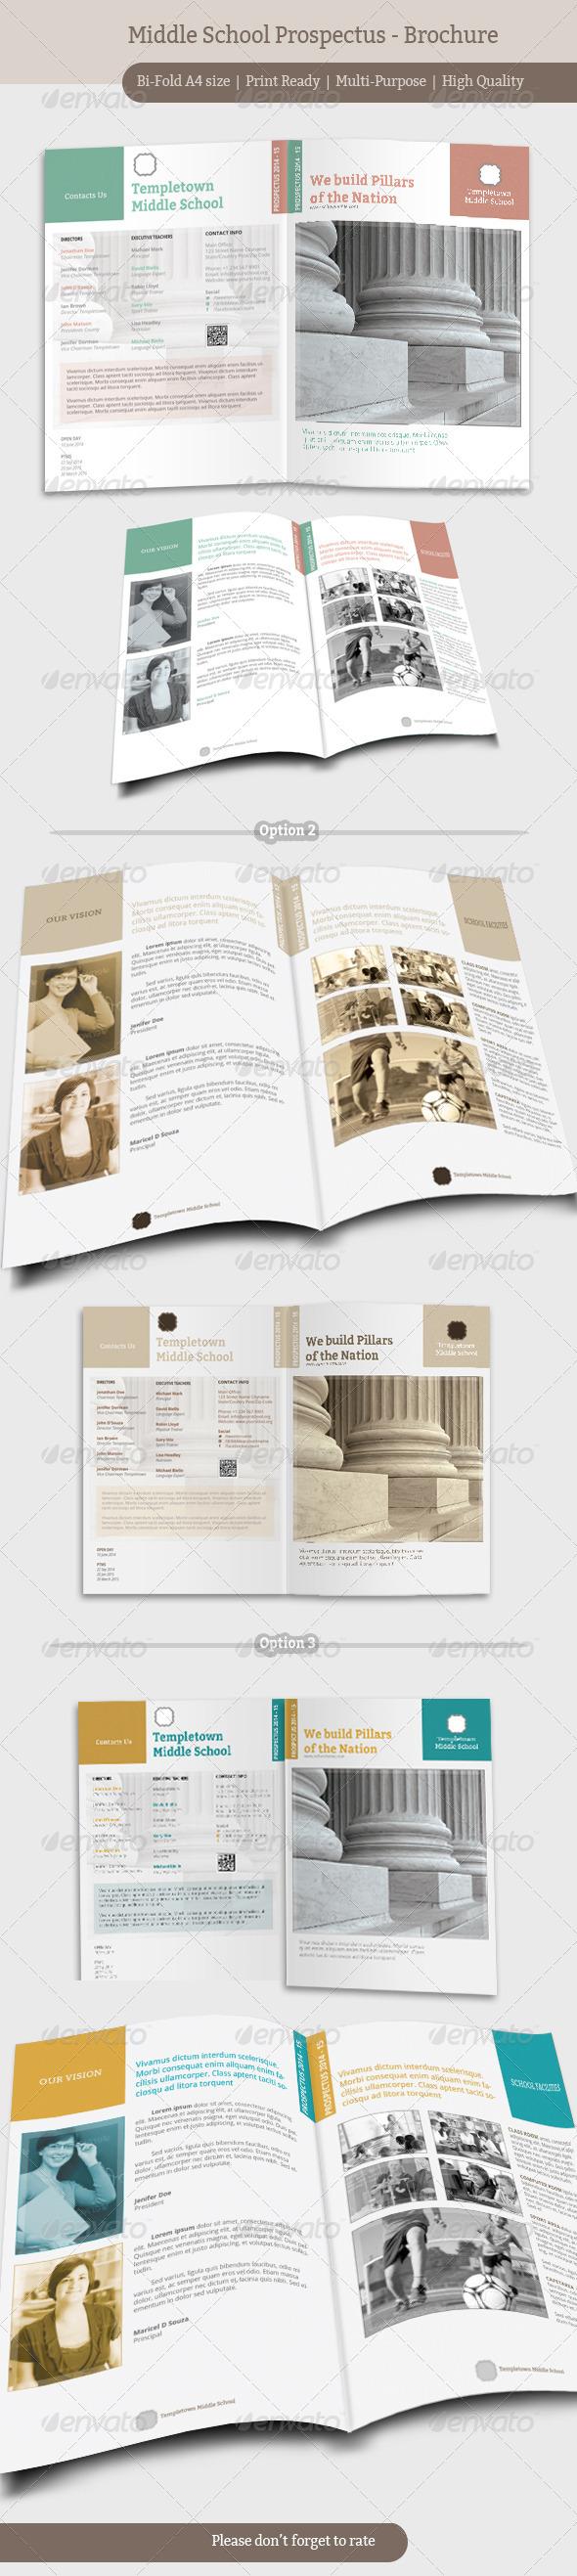 GraphicRiver Middle School Prospectus Brochure 6904734